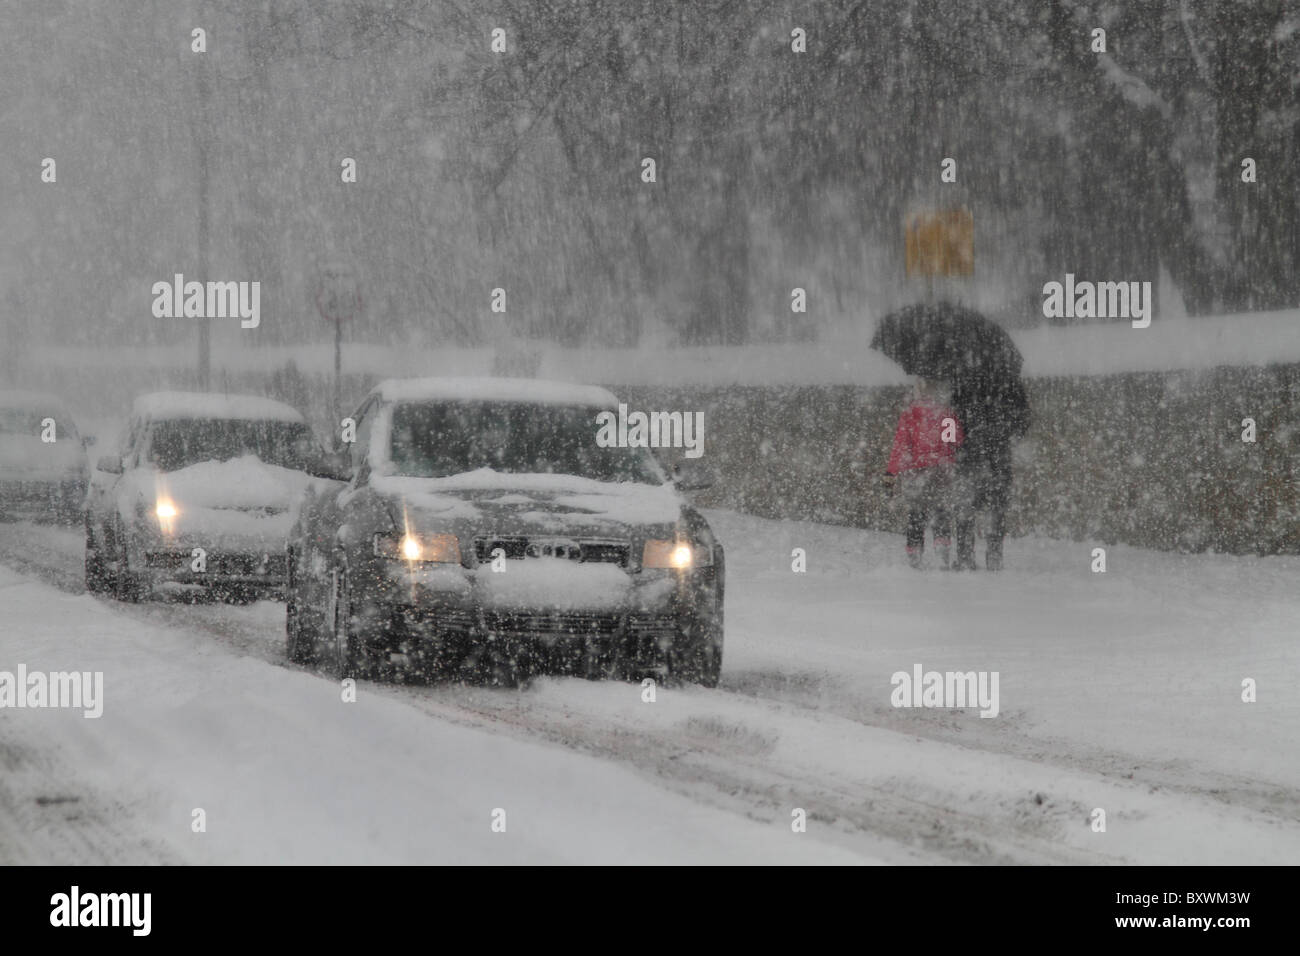 Hazardous dangerous driving conditions winter snow ice blizzard - Stock Image